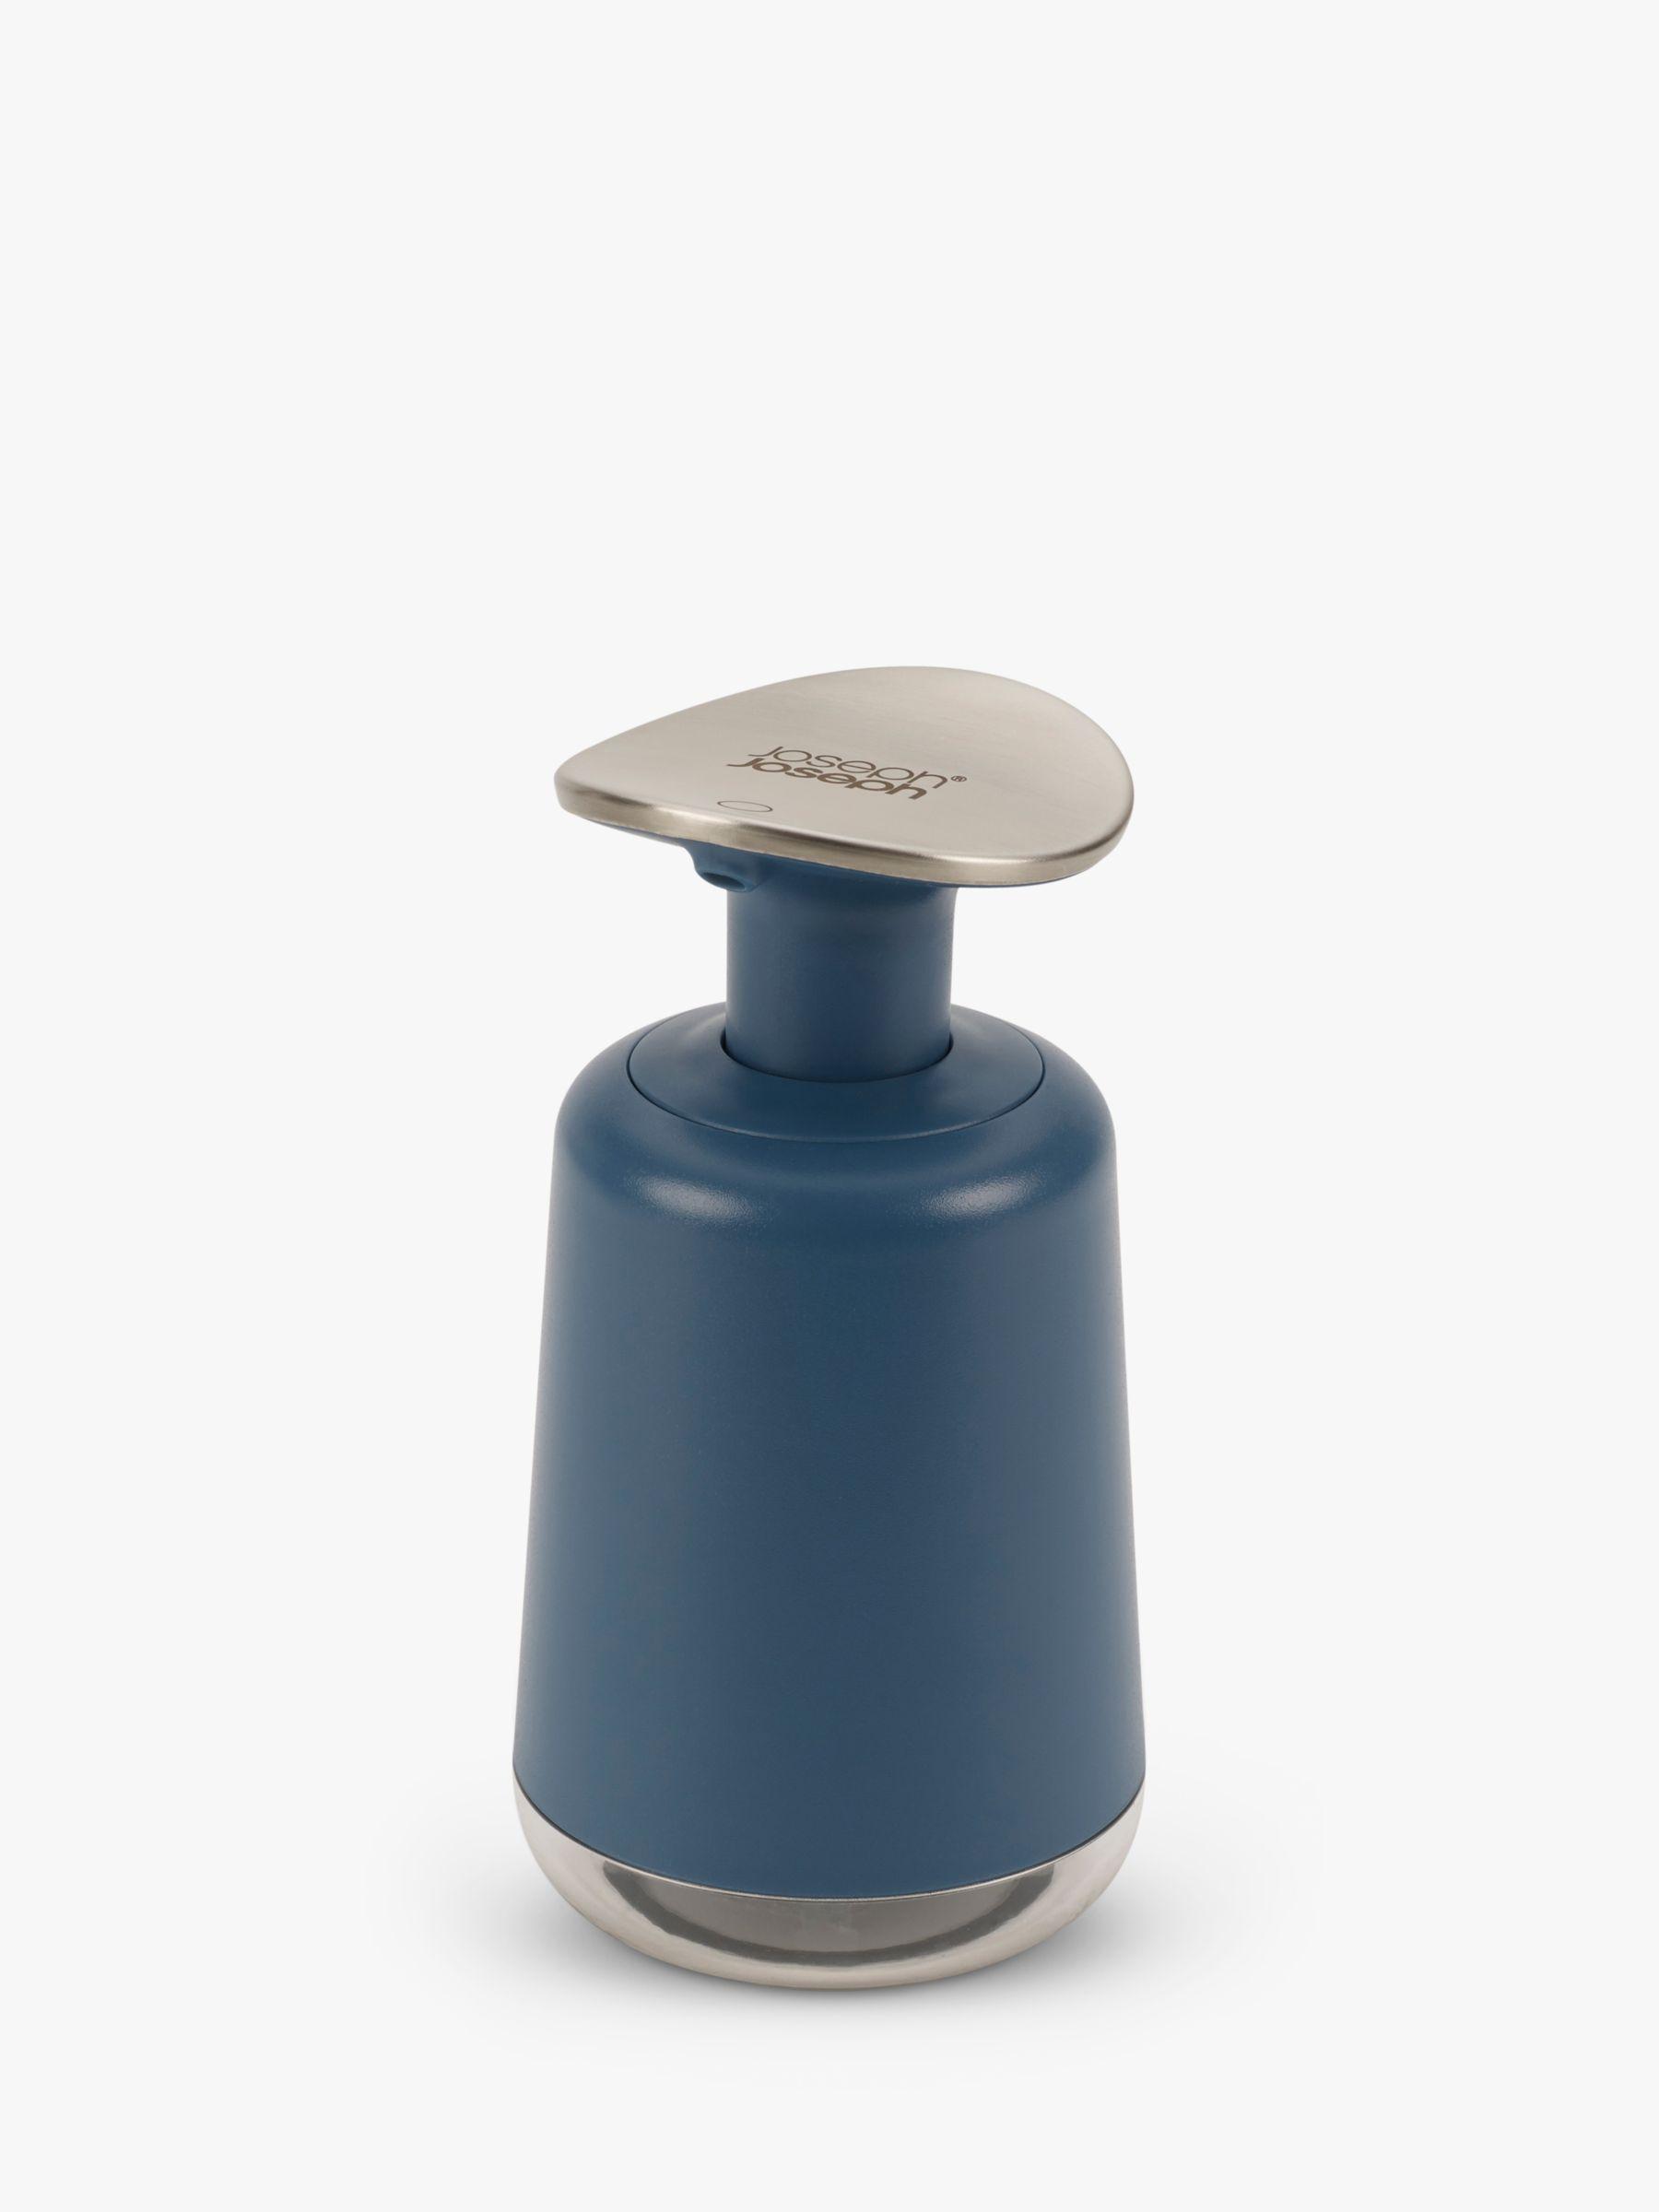 Joseph Joseph Editions Soap Pump, Sky Blue